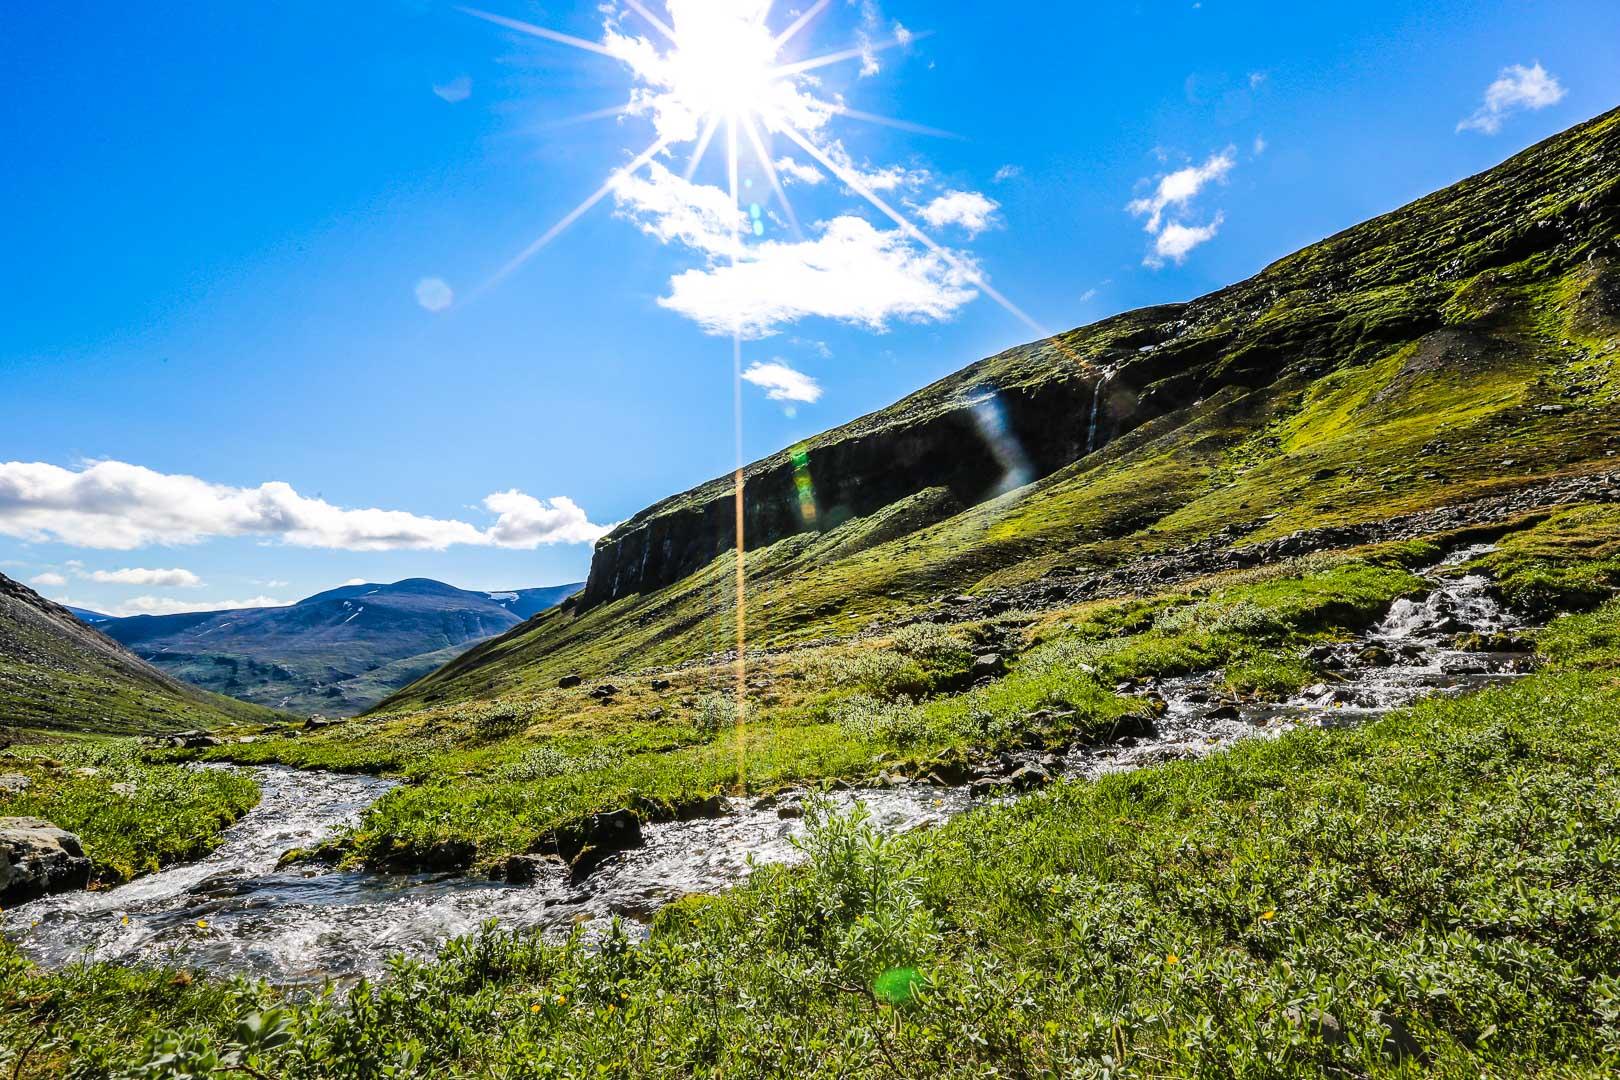 Tarfala Valley